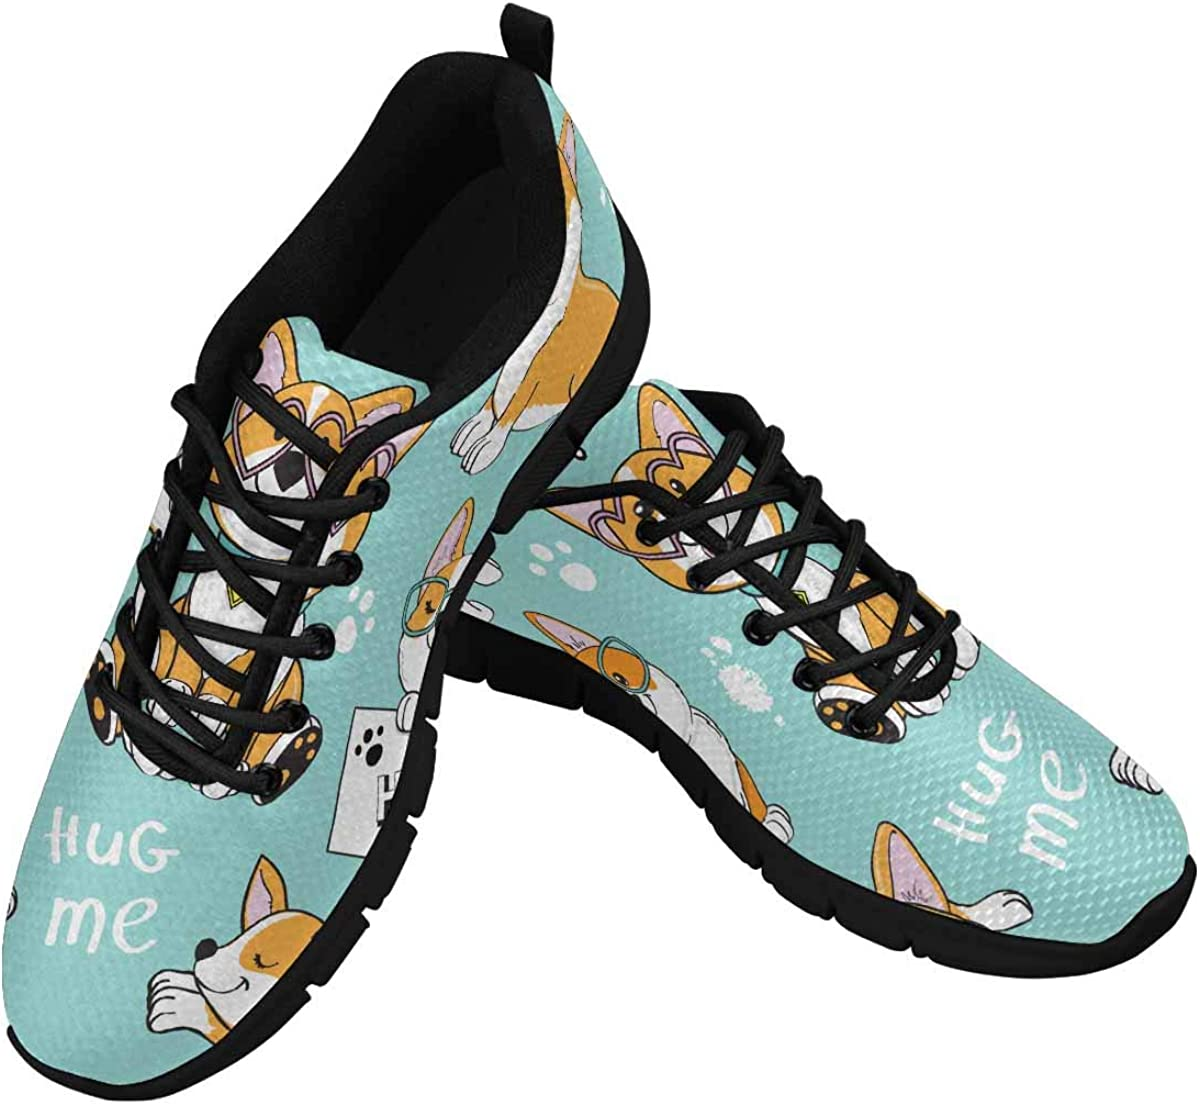 InterestPrint Cute Dog Corgi Collection Women's Athletic Walking Shoes Breathe Comfort Mesh